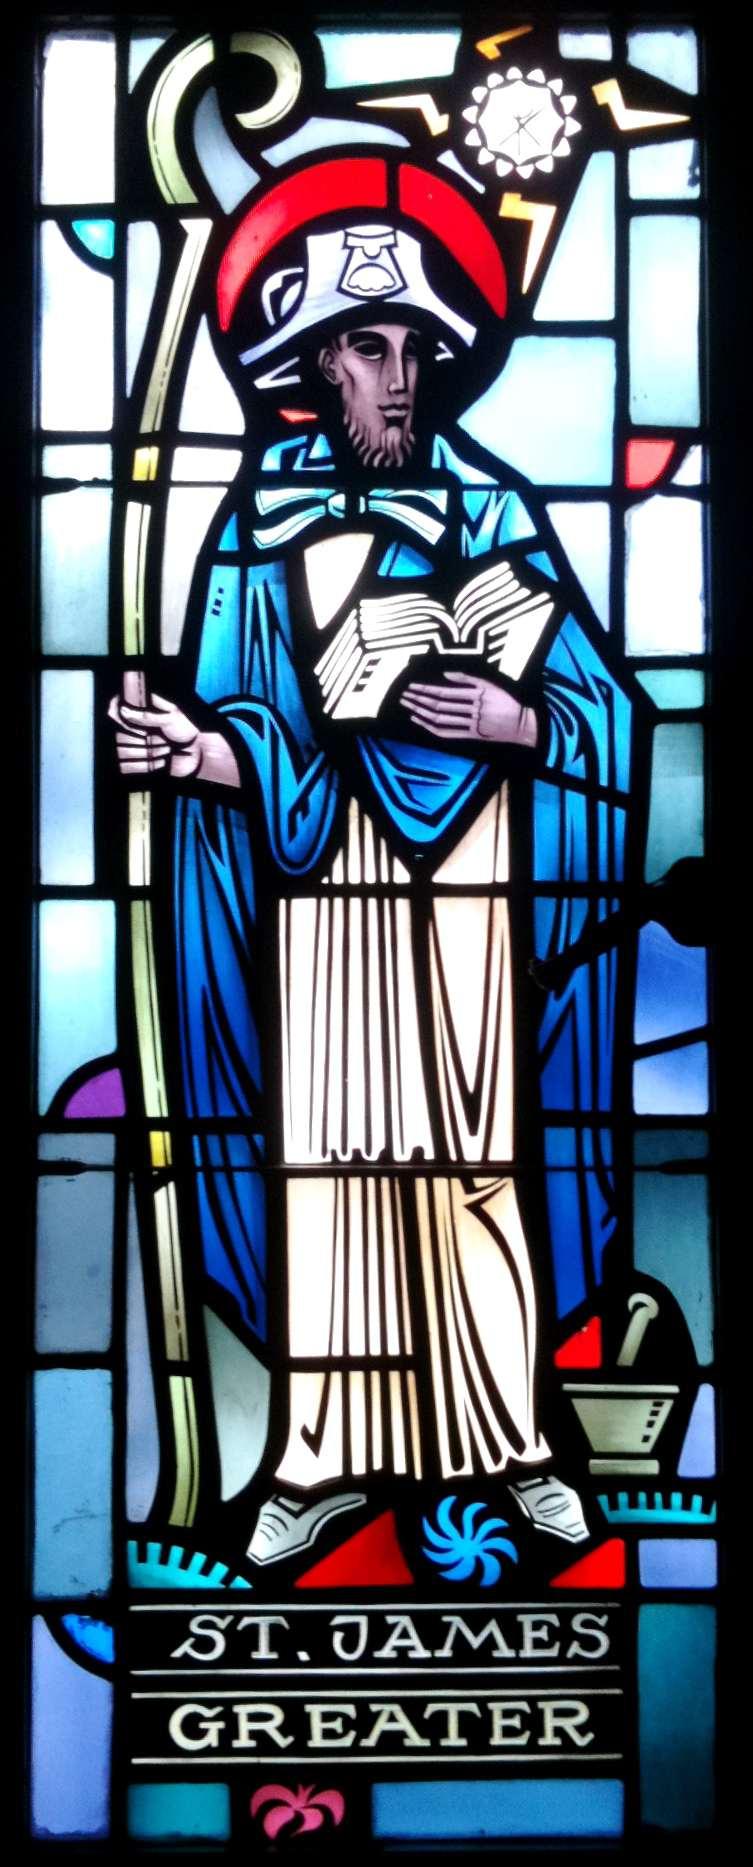 Saint James the Greater, St. Peter's Cathedral, Rockford, Illinois. (Photo © Scott P. Richert)